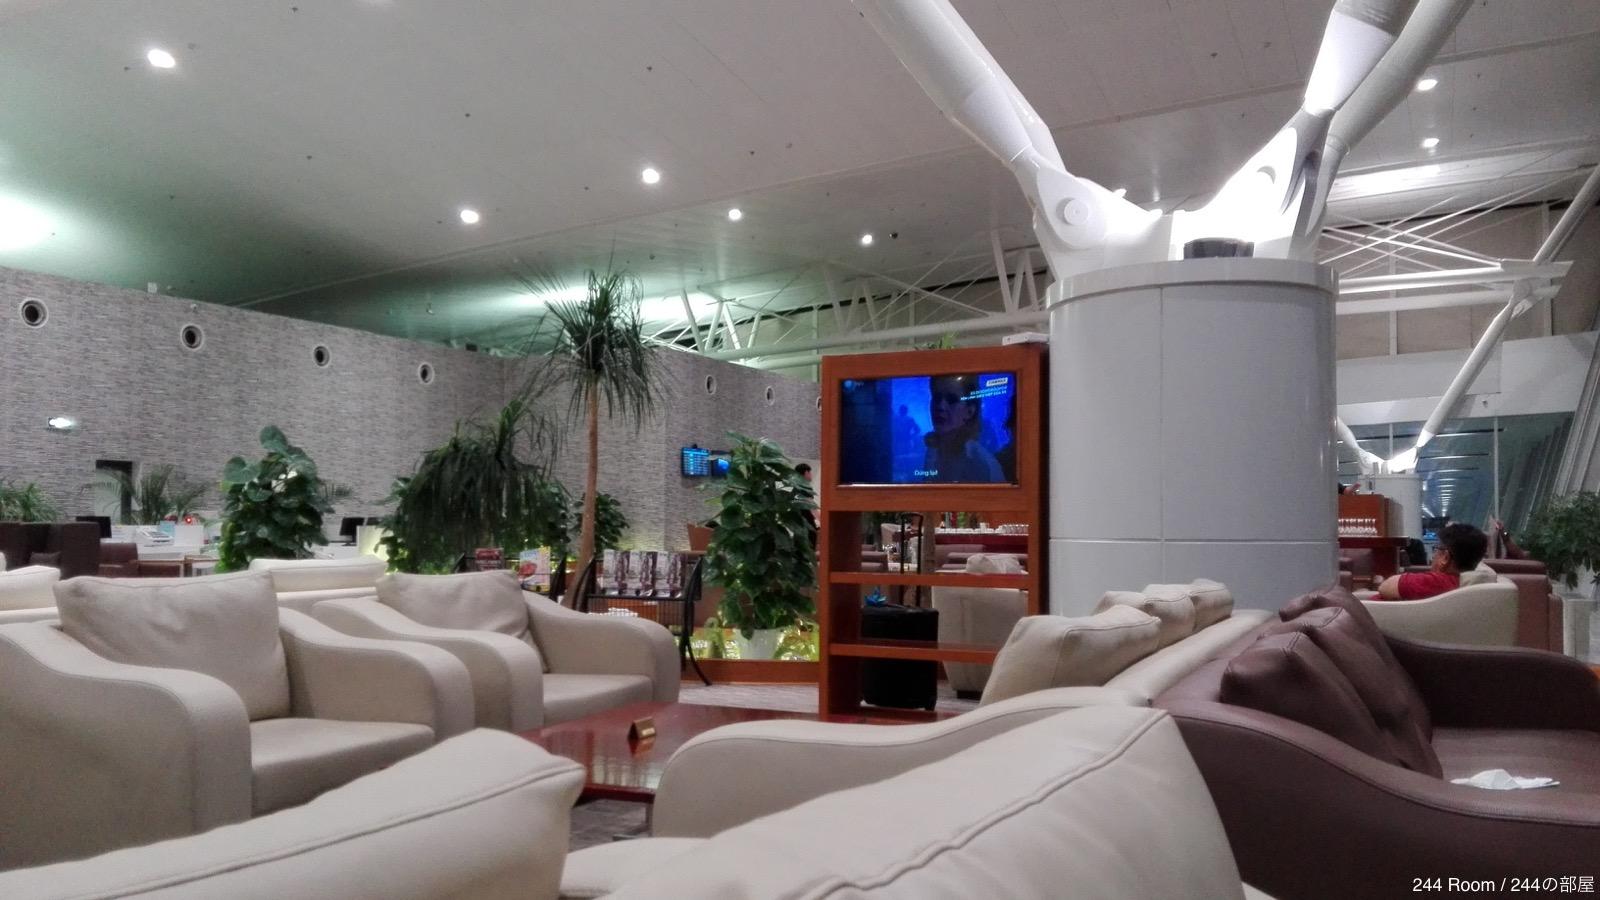 Noibai-airport-Business-Lounge-room